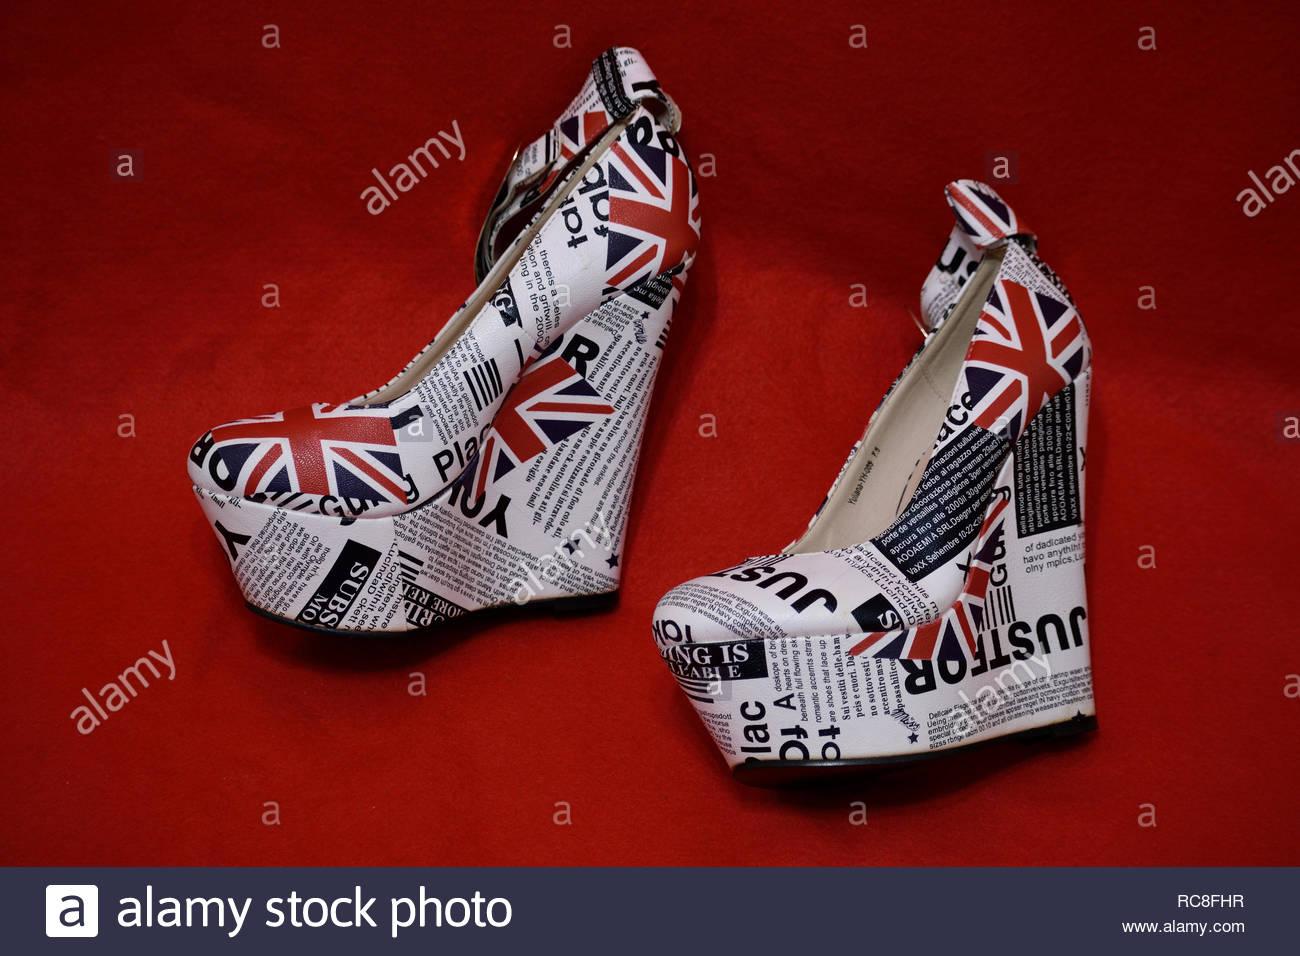 dce6168ab6 Plattform Schuhe. Hoch 6 cm Keilabsatz. Frauen high heel Plateauschuhe.  Plattform Fersen mit